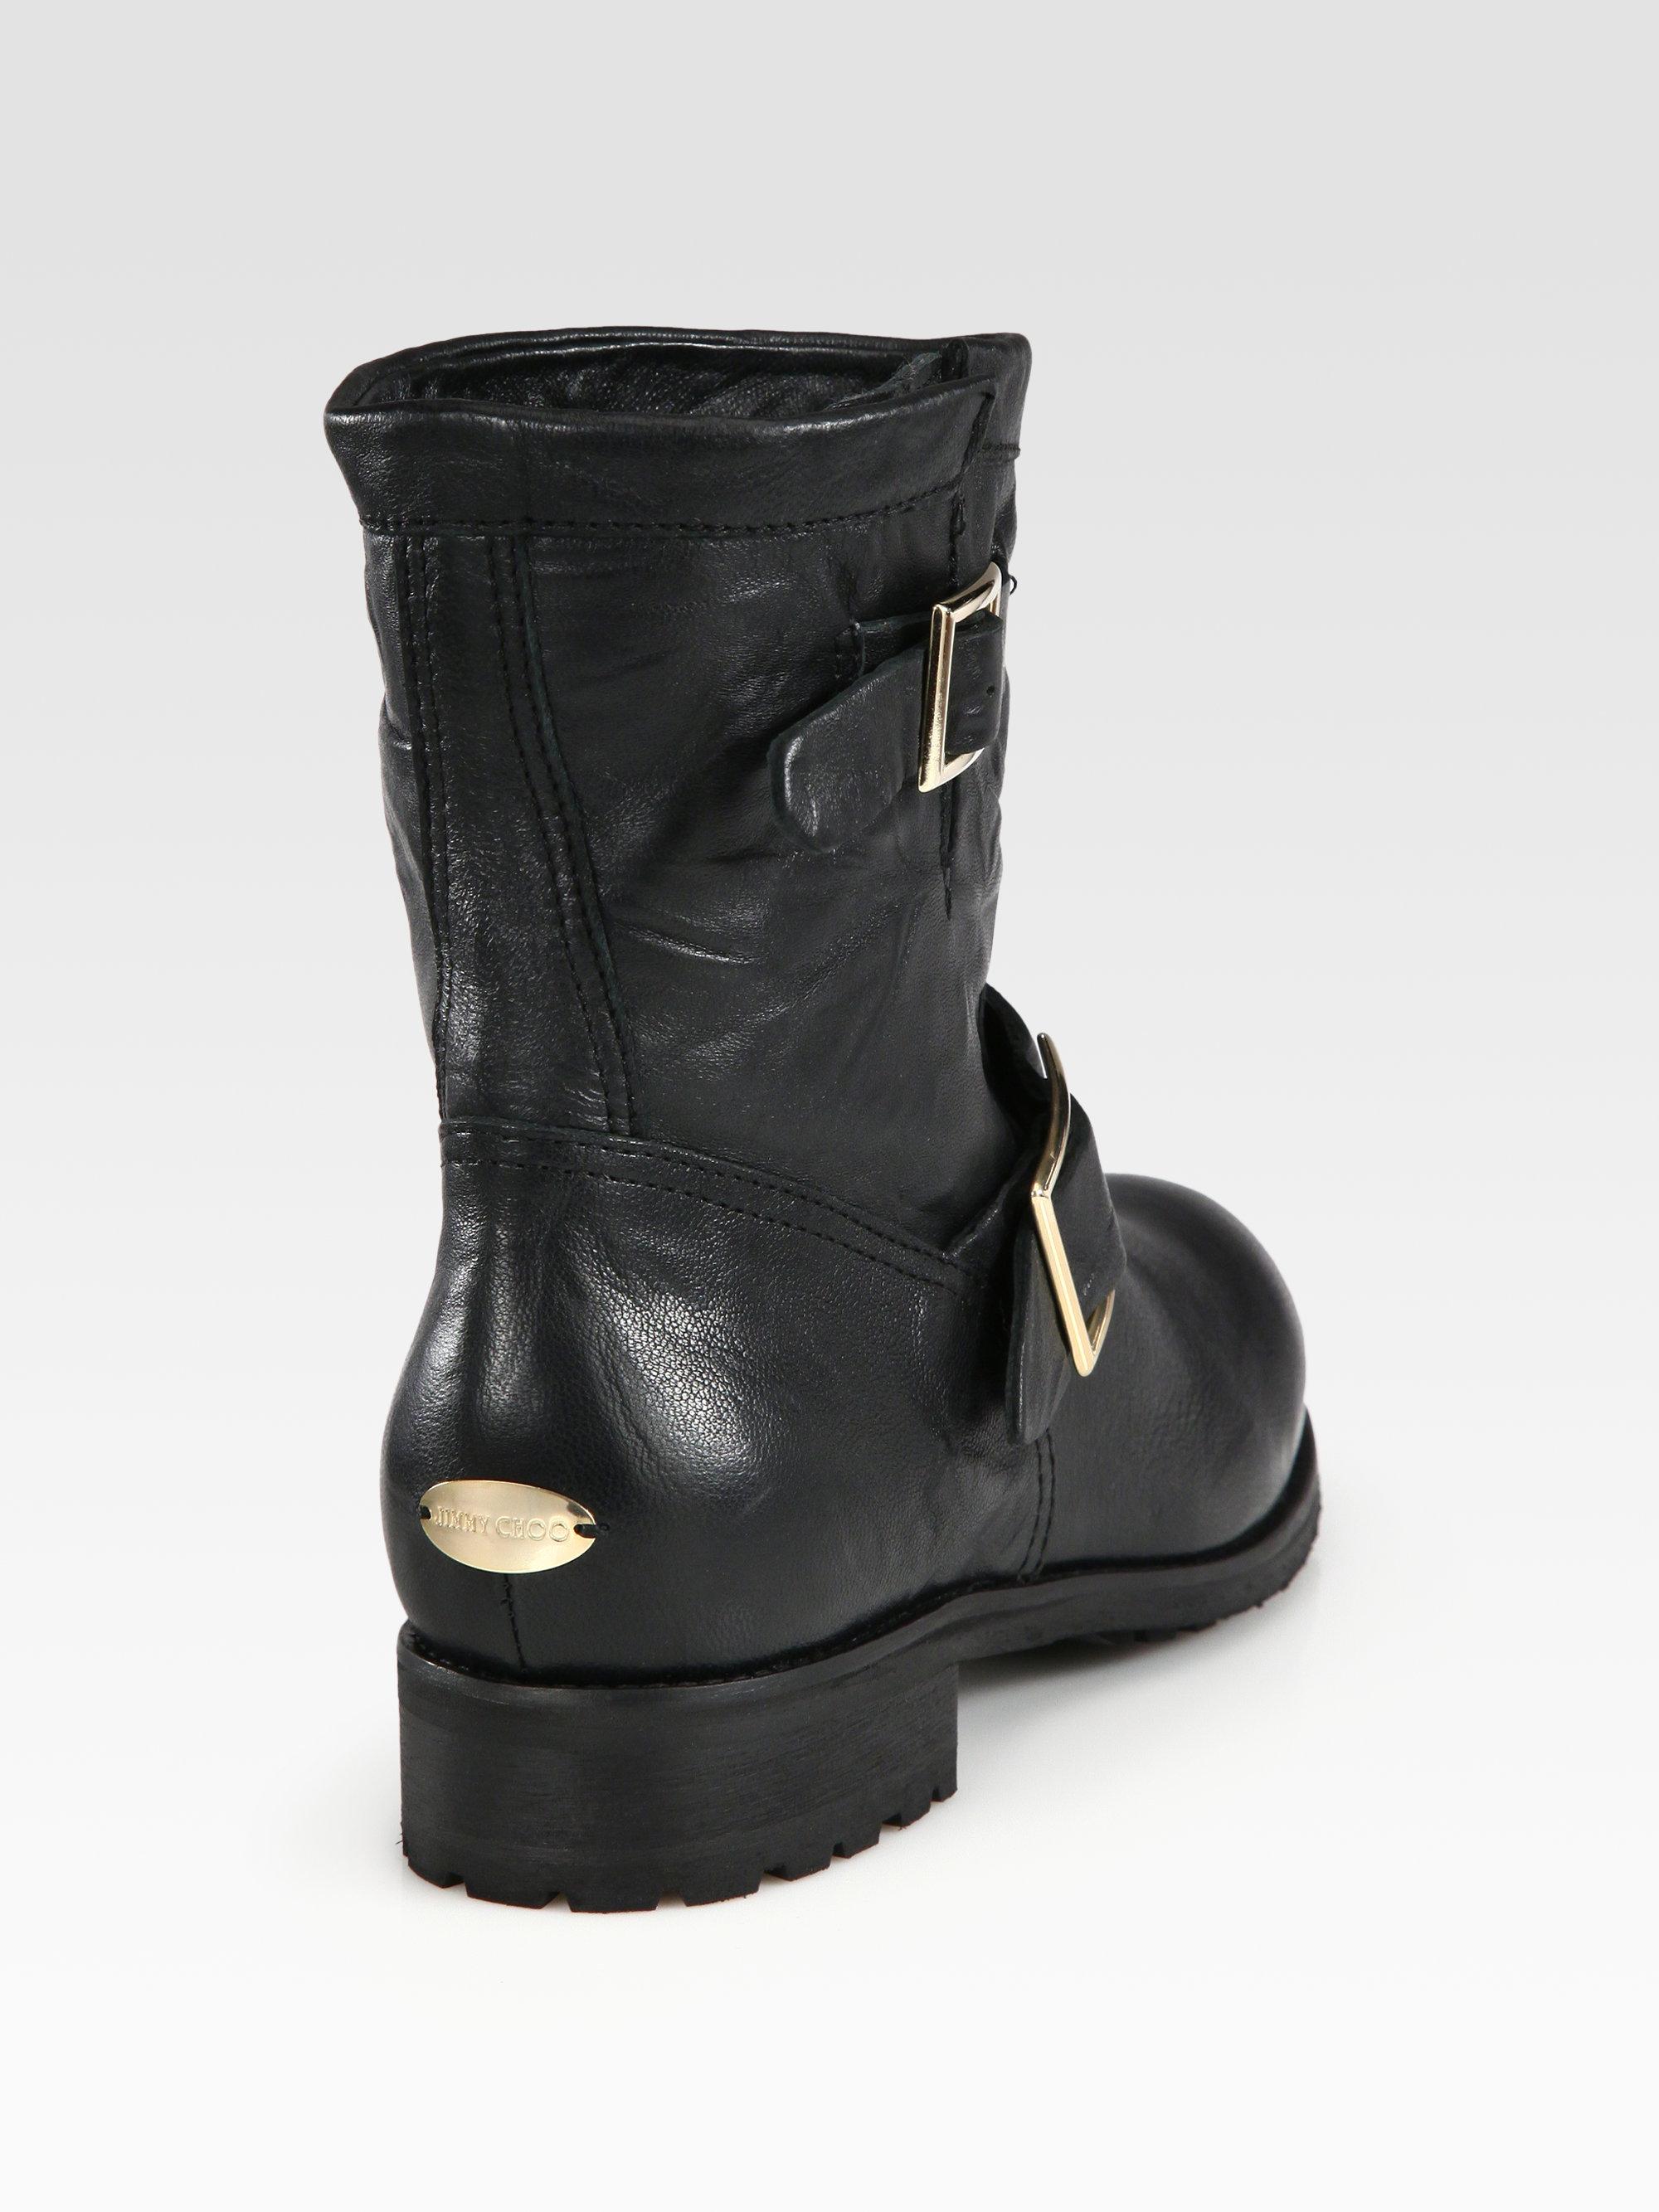 072b80c318b ... jimmy choo biker boots lined with shearling coats ...